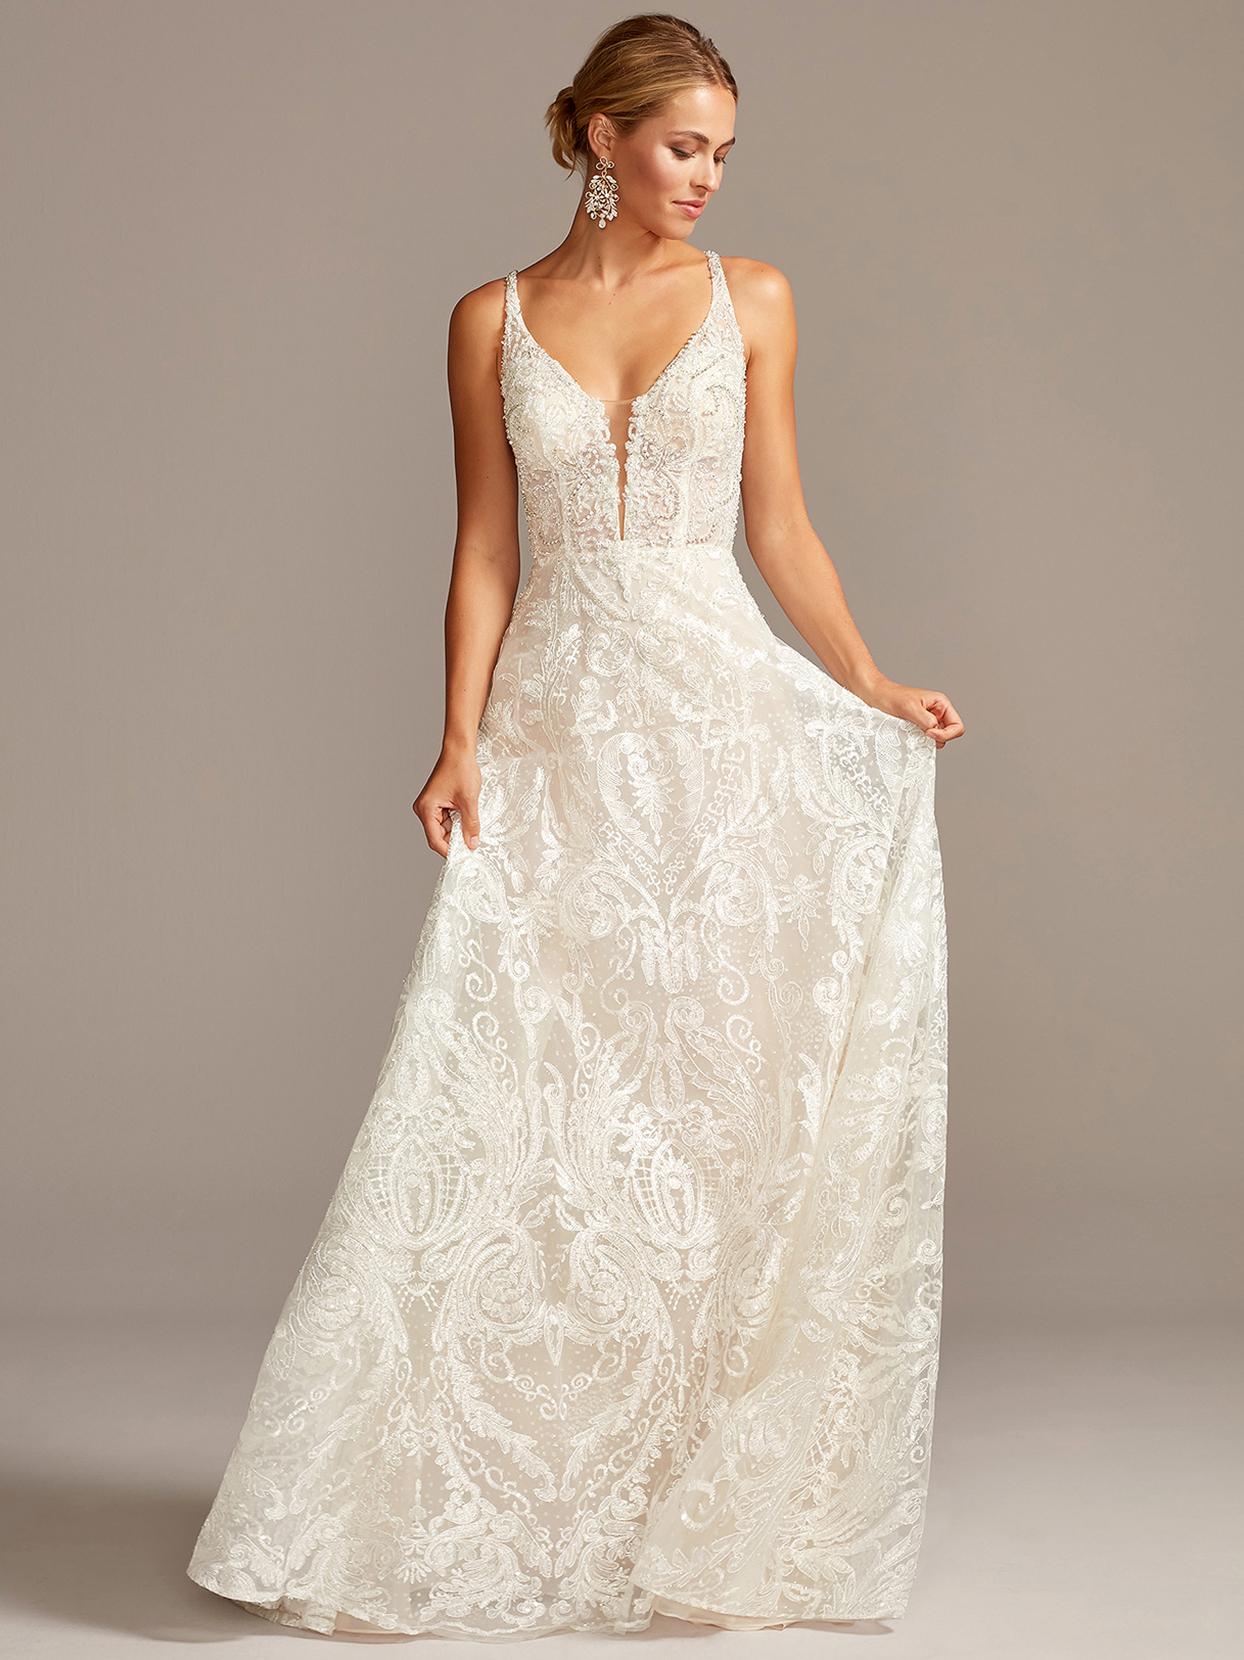 davids bridal galina embroidered illusion plunging neck wedding dress fall 2020